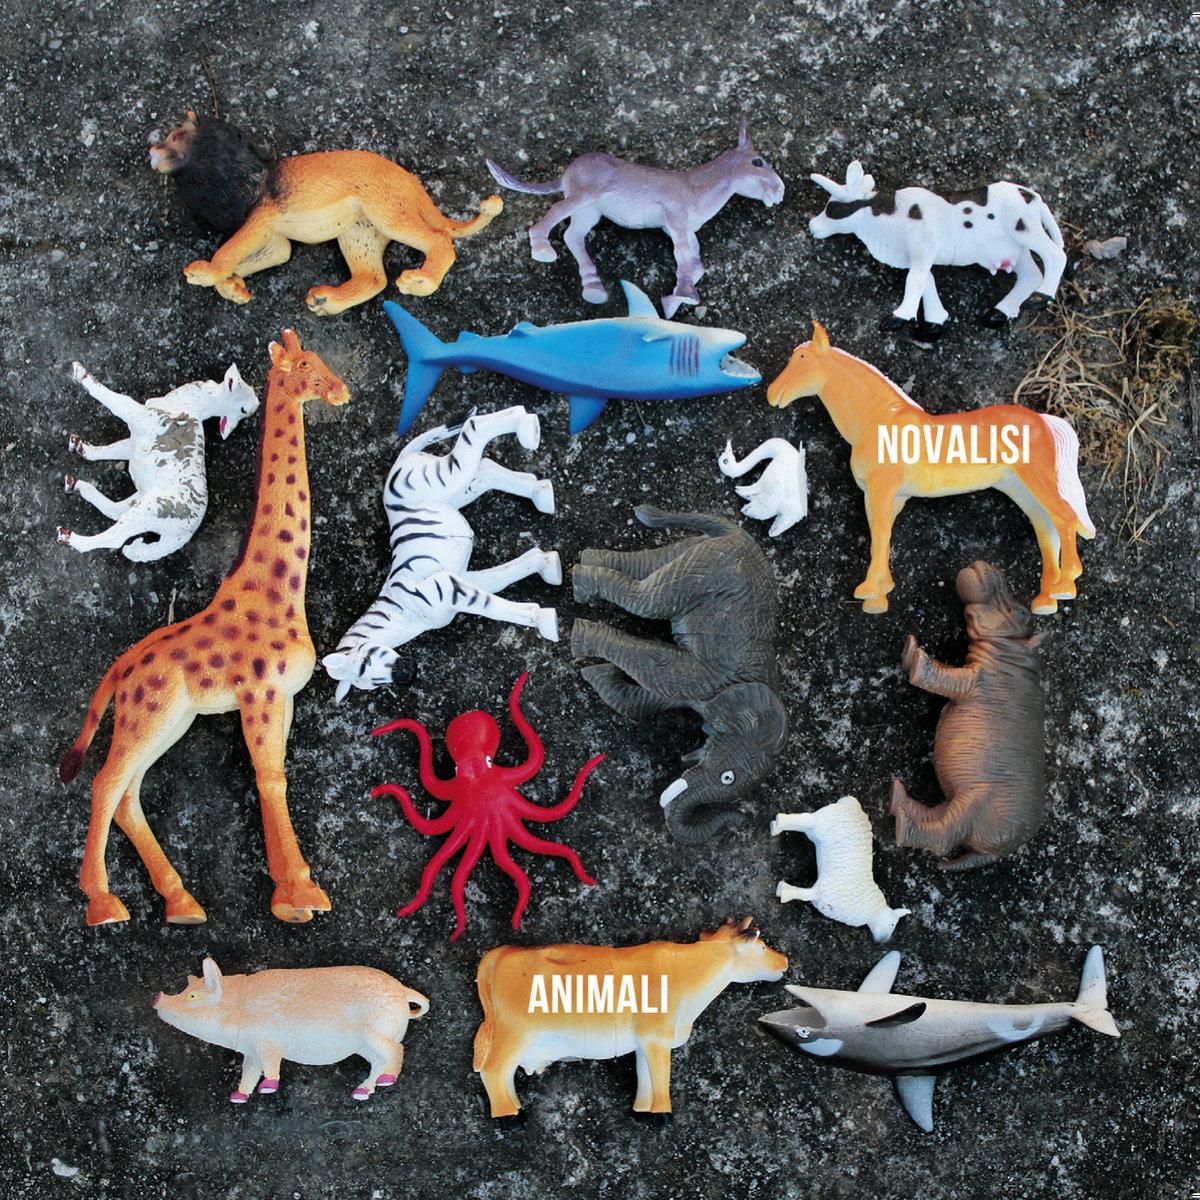 Novalisi Animali